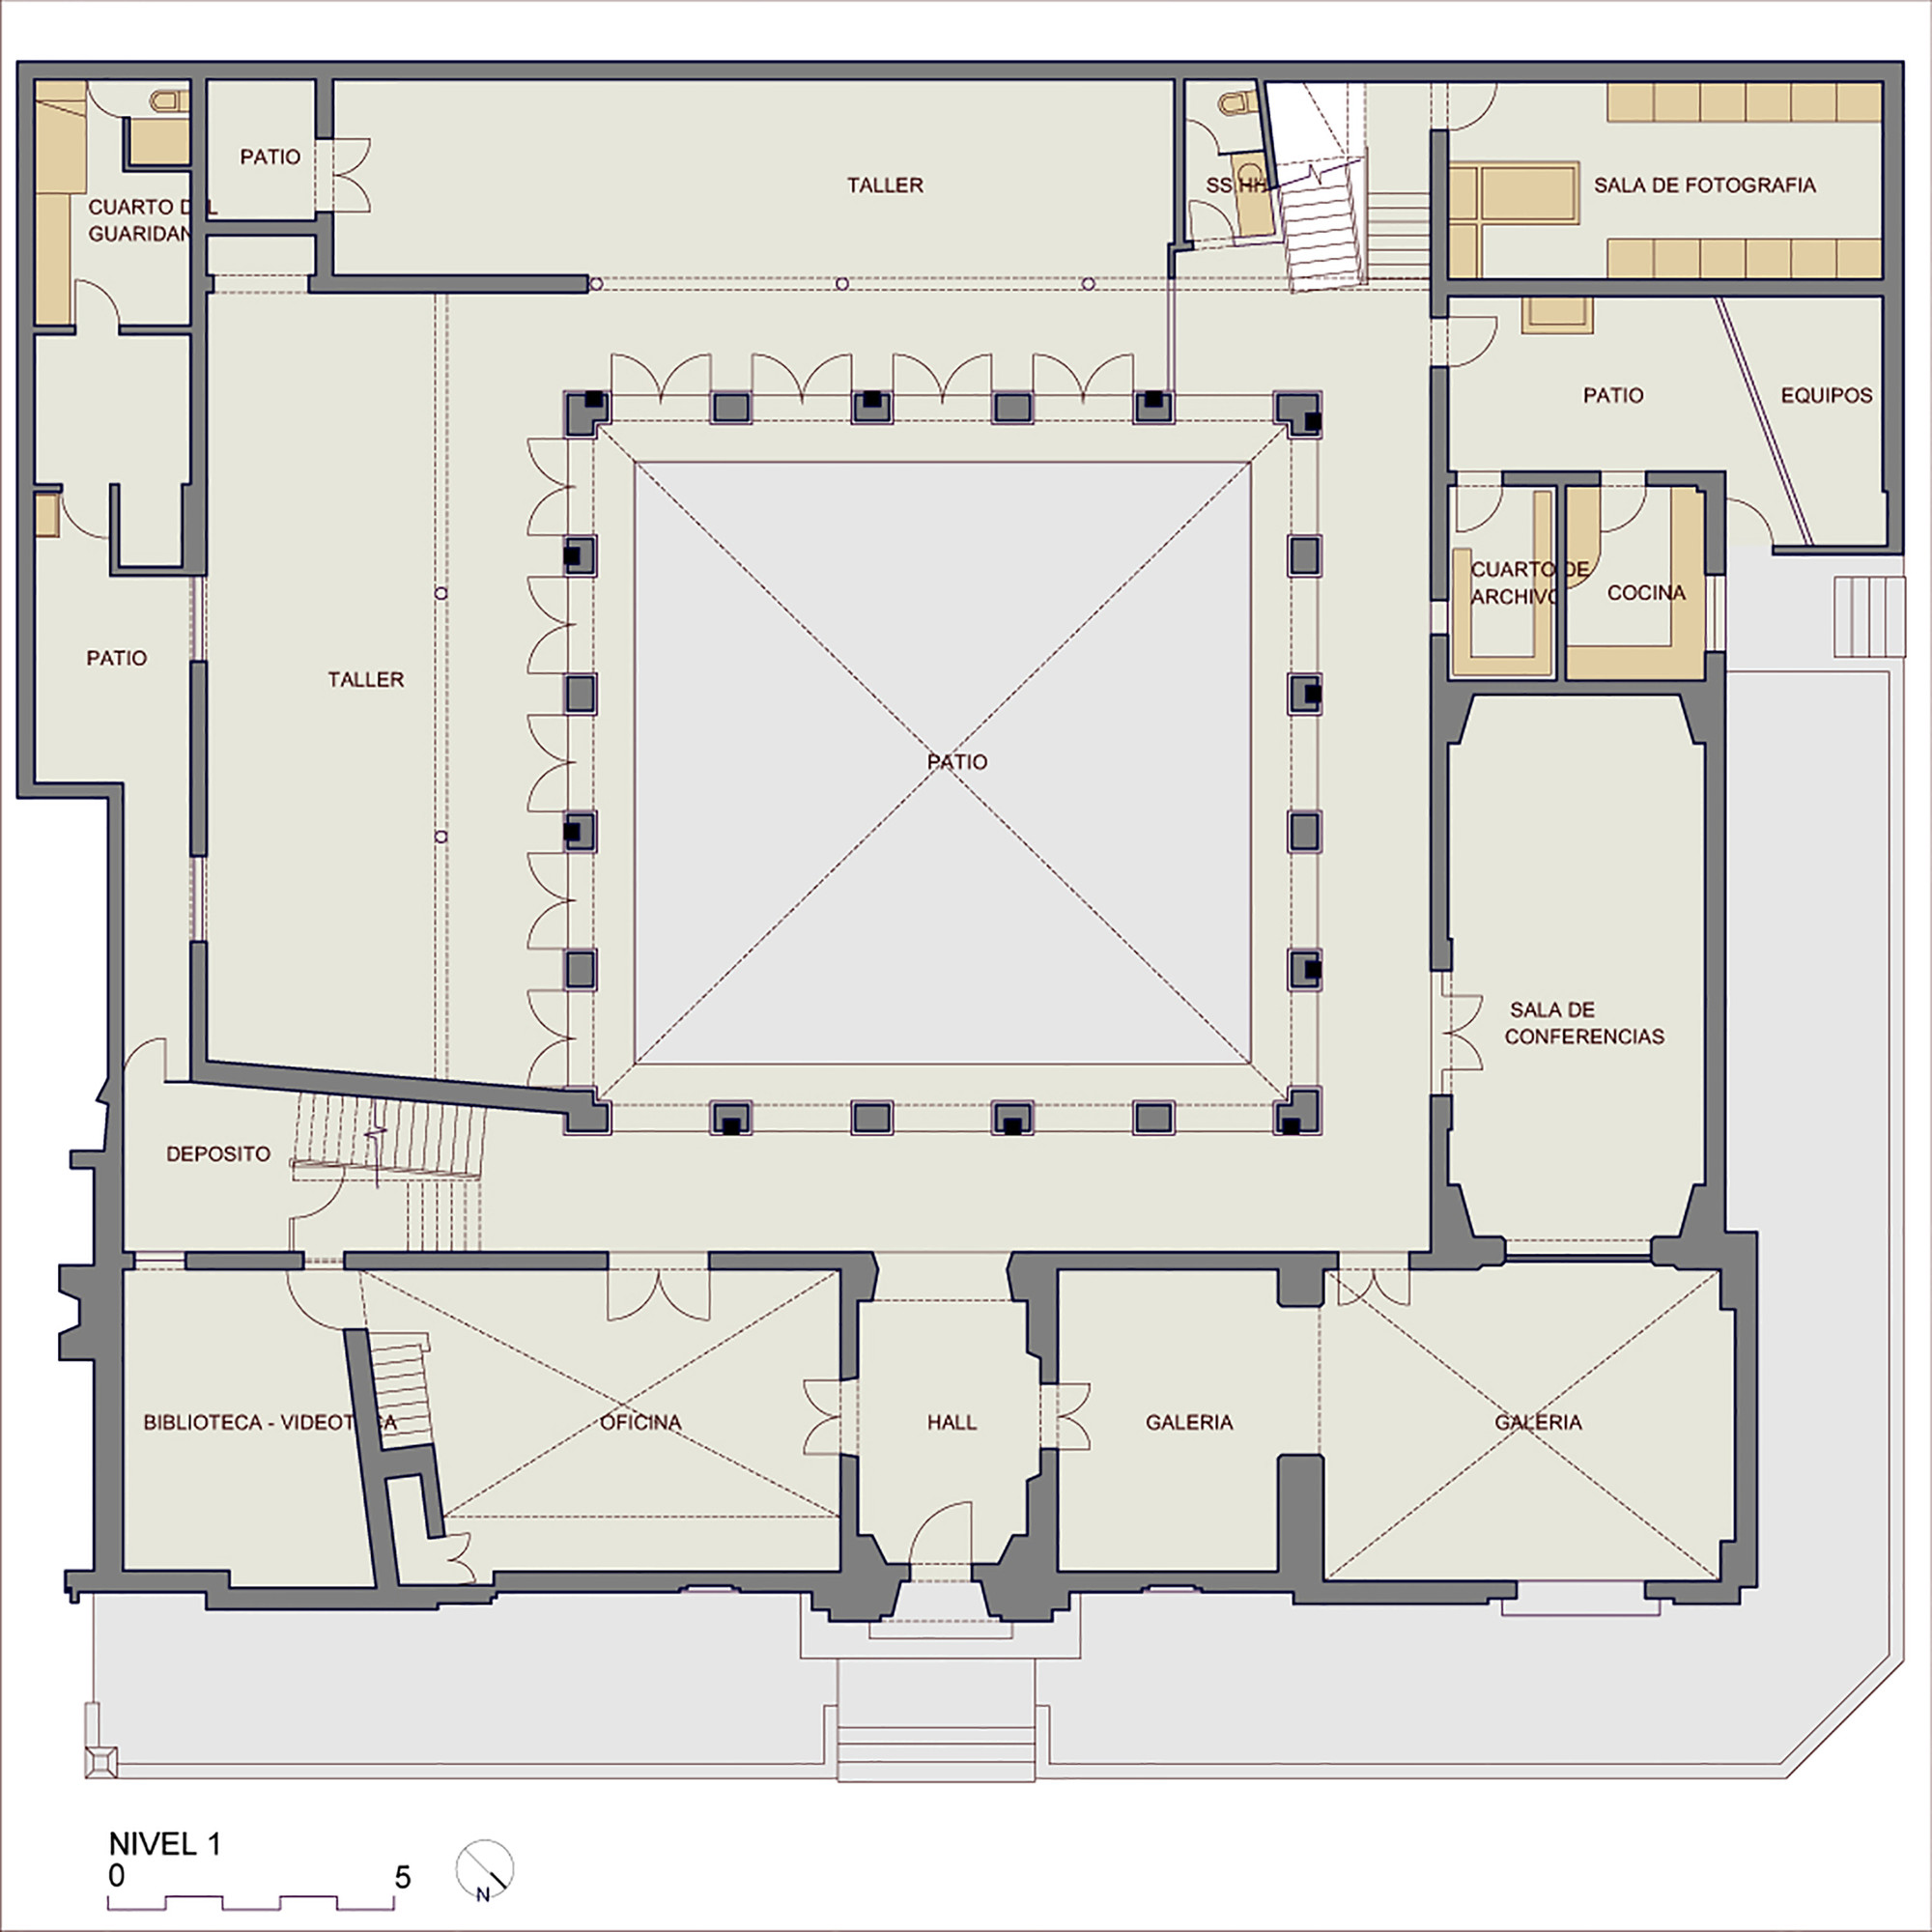 Galeria Arquitectonica: Gallery Of Visual Arts School / Barclay & Crousse